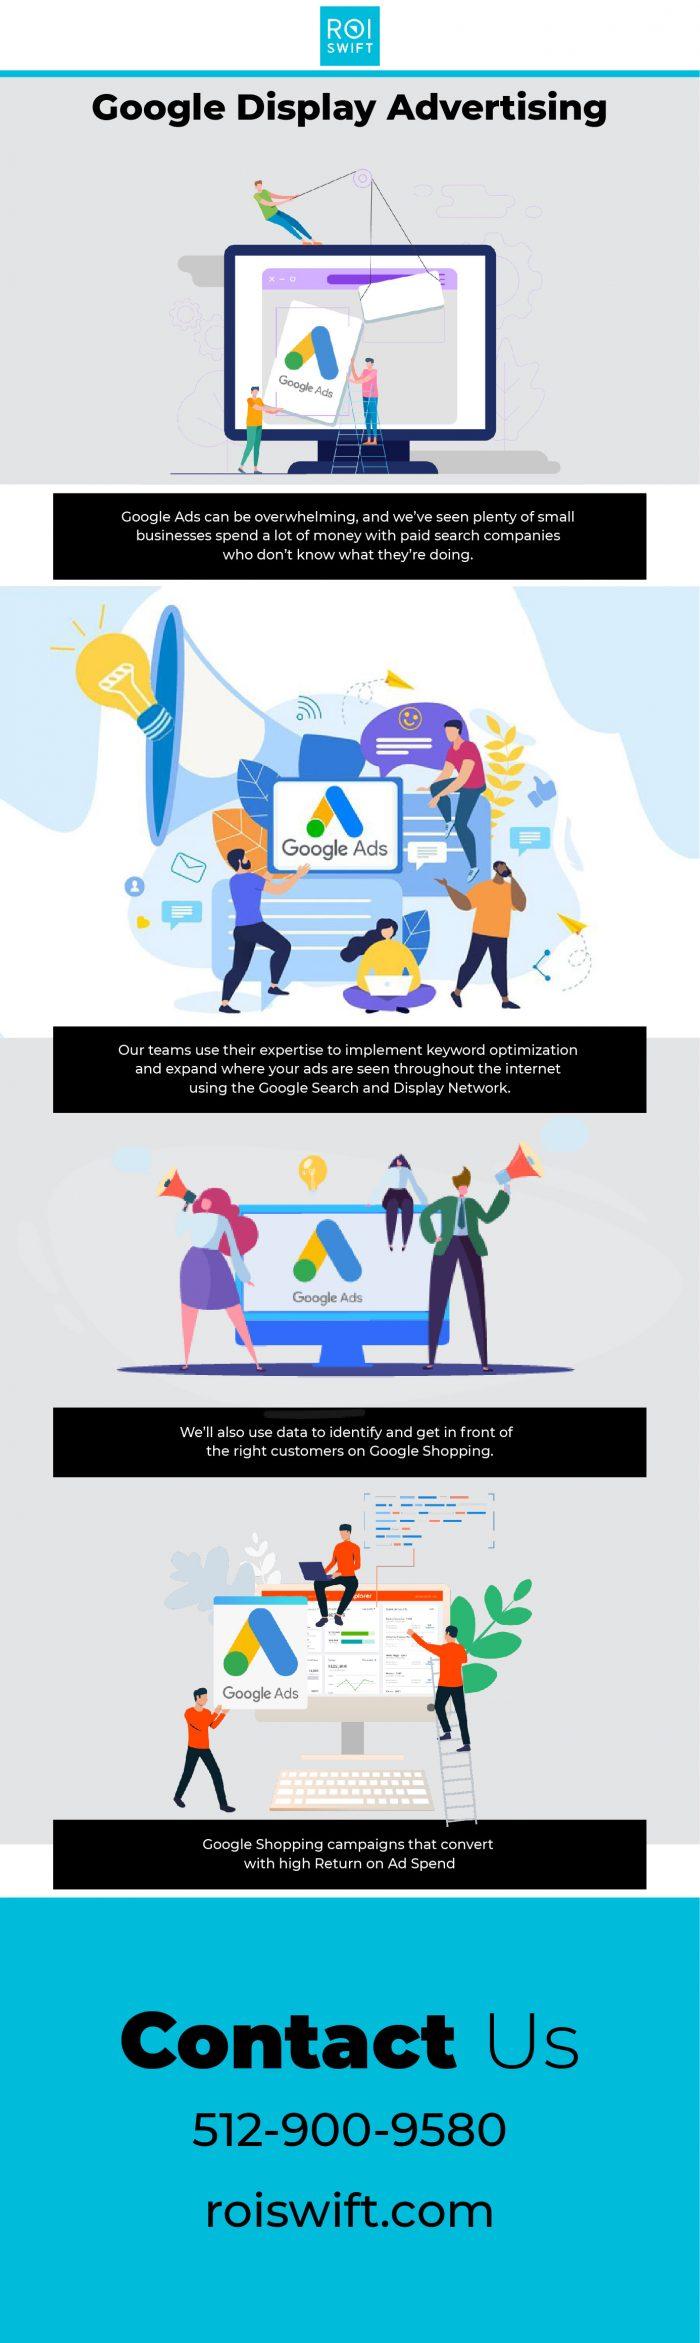 Best Google Display Advertising at Online – ROI Swift